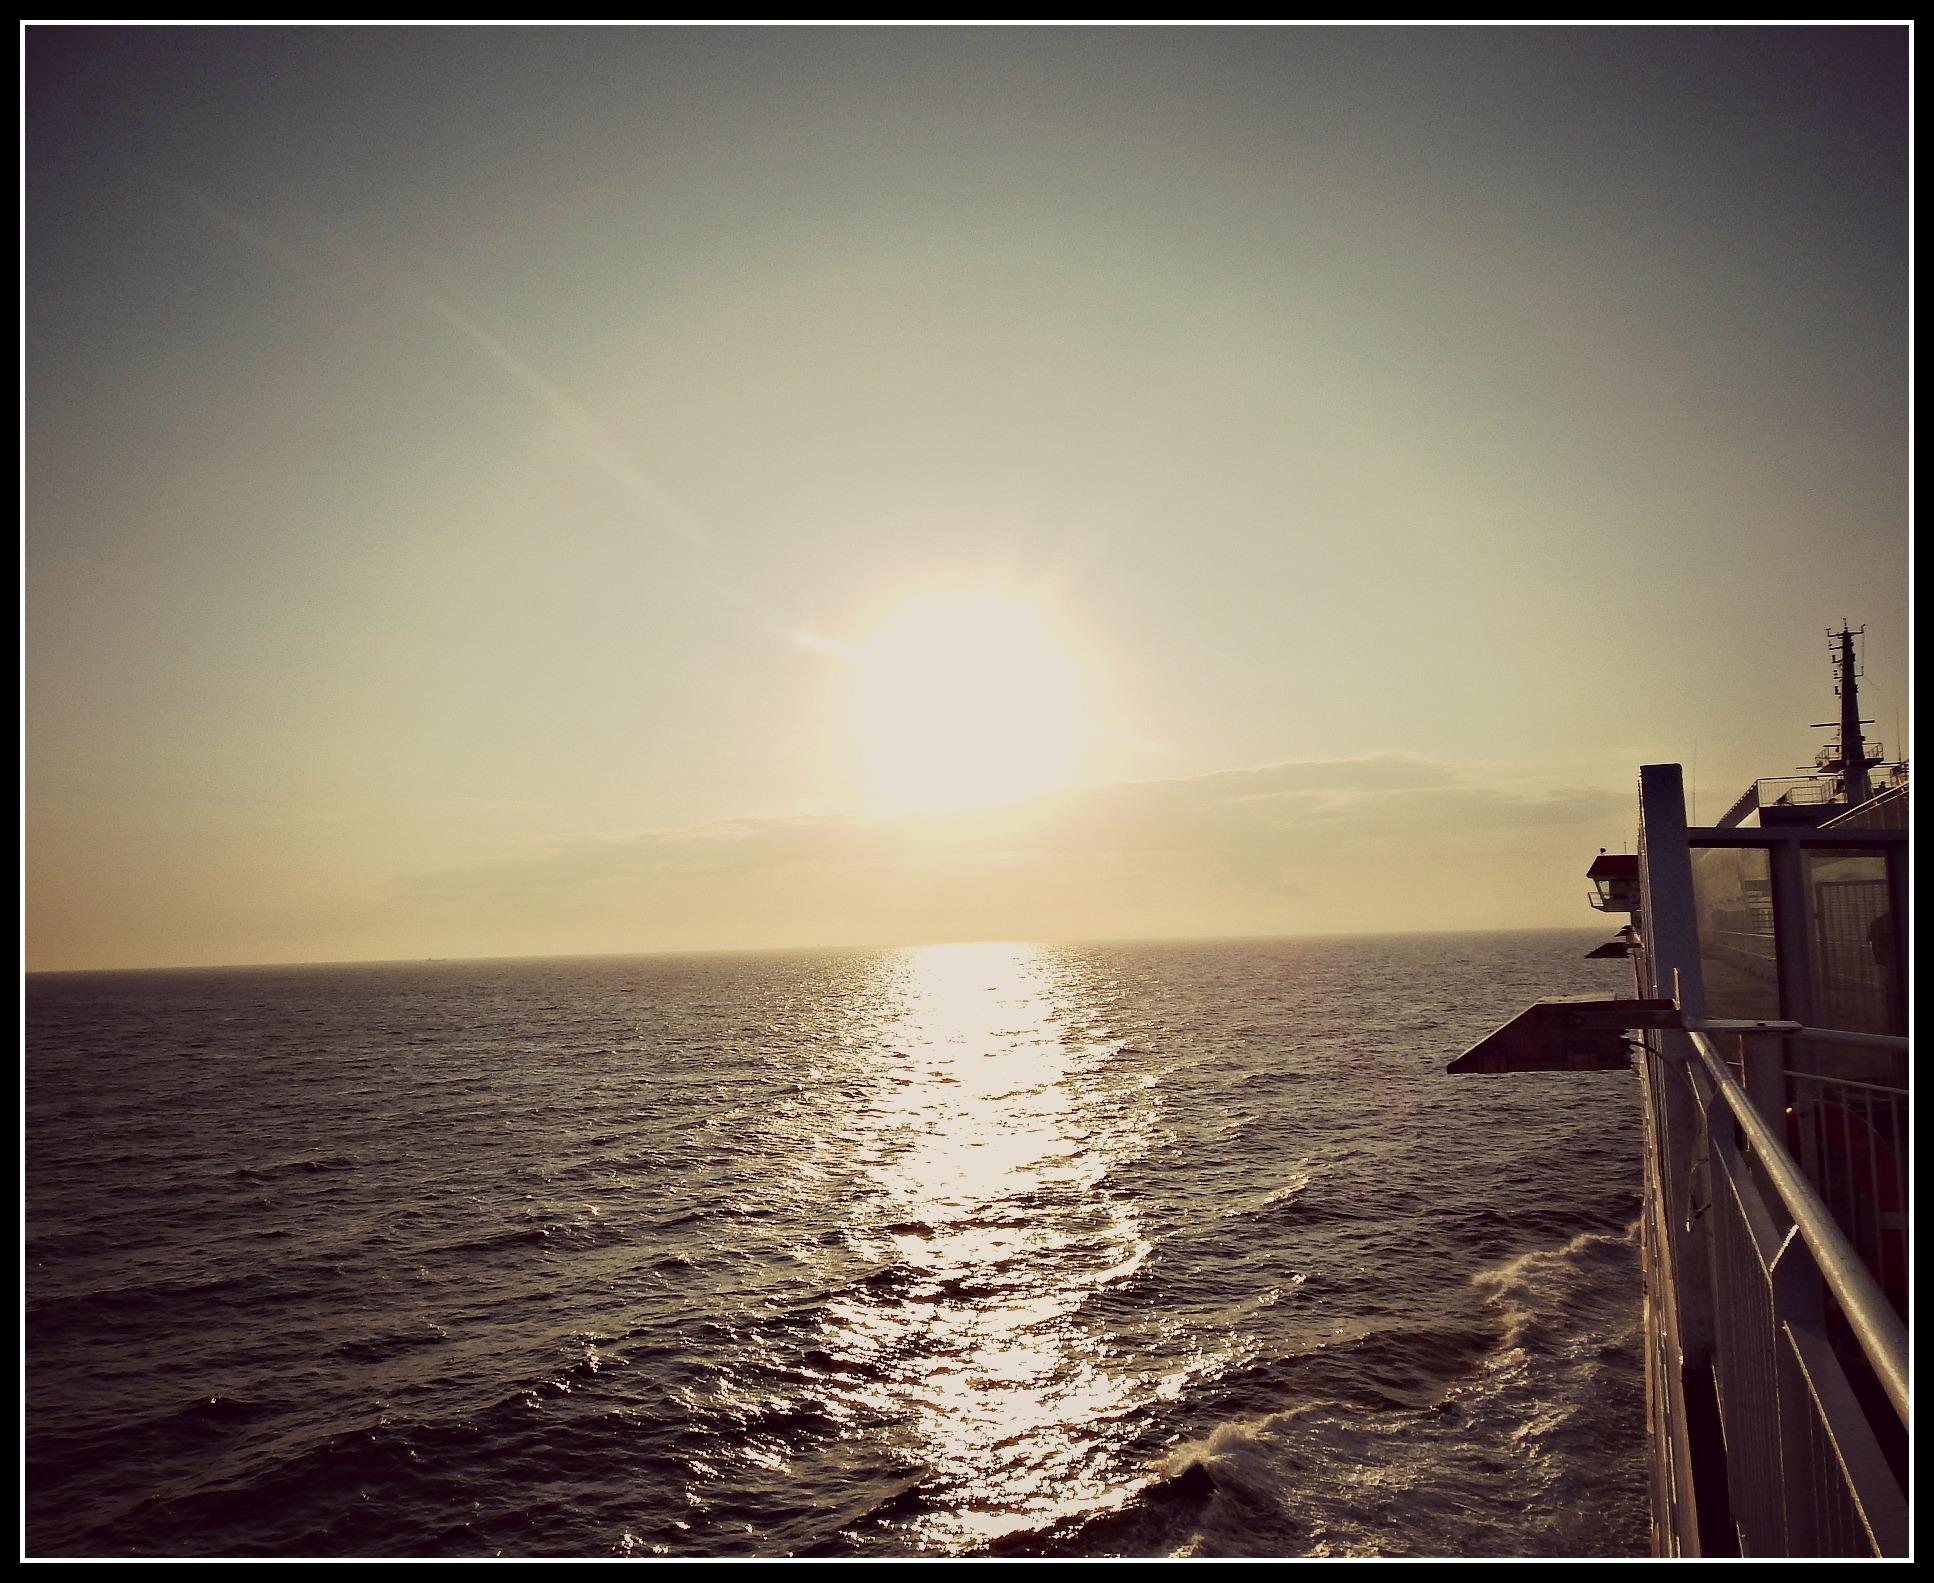 Sunset over the English Channel #MySundayPhoto